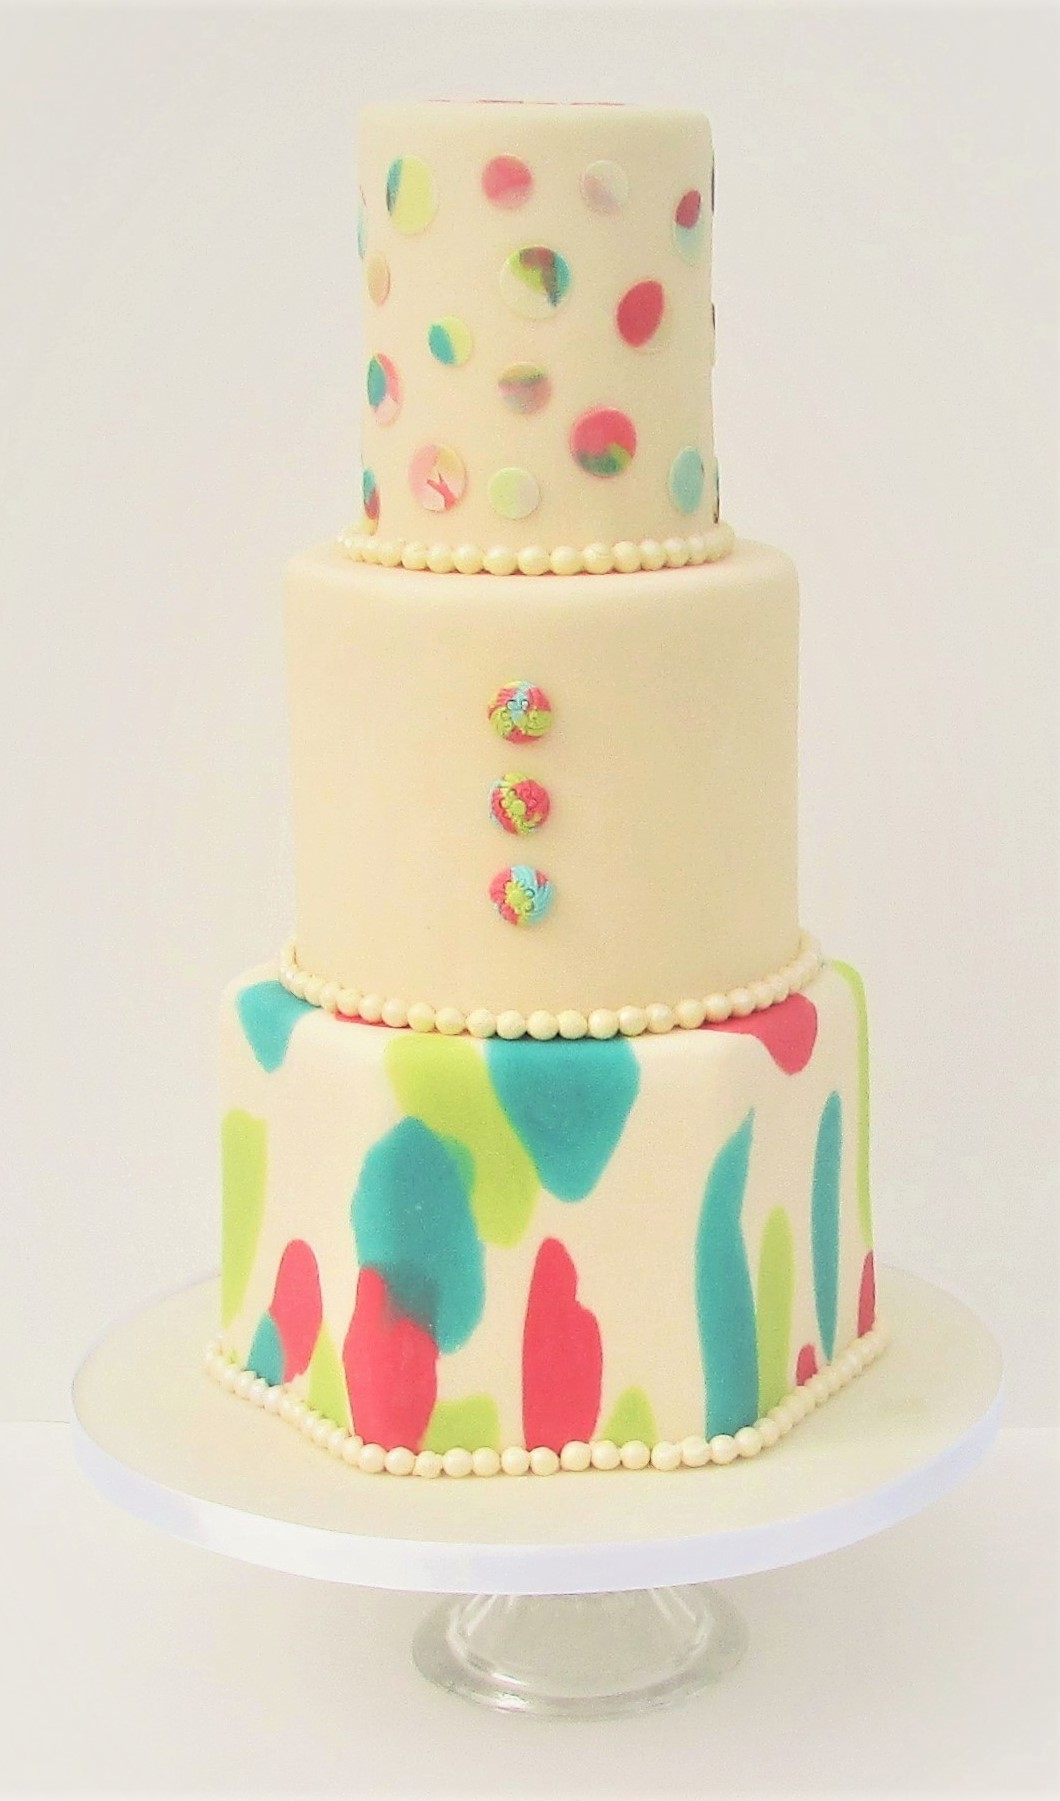 Cream wedding cake with coloured spots